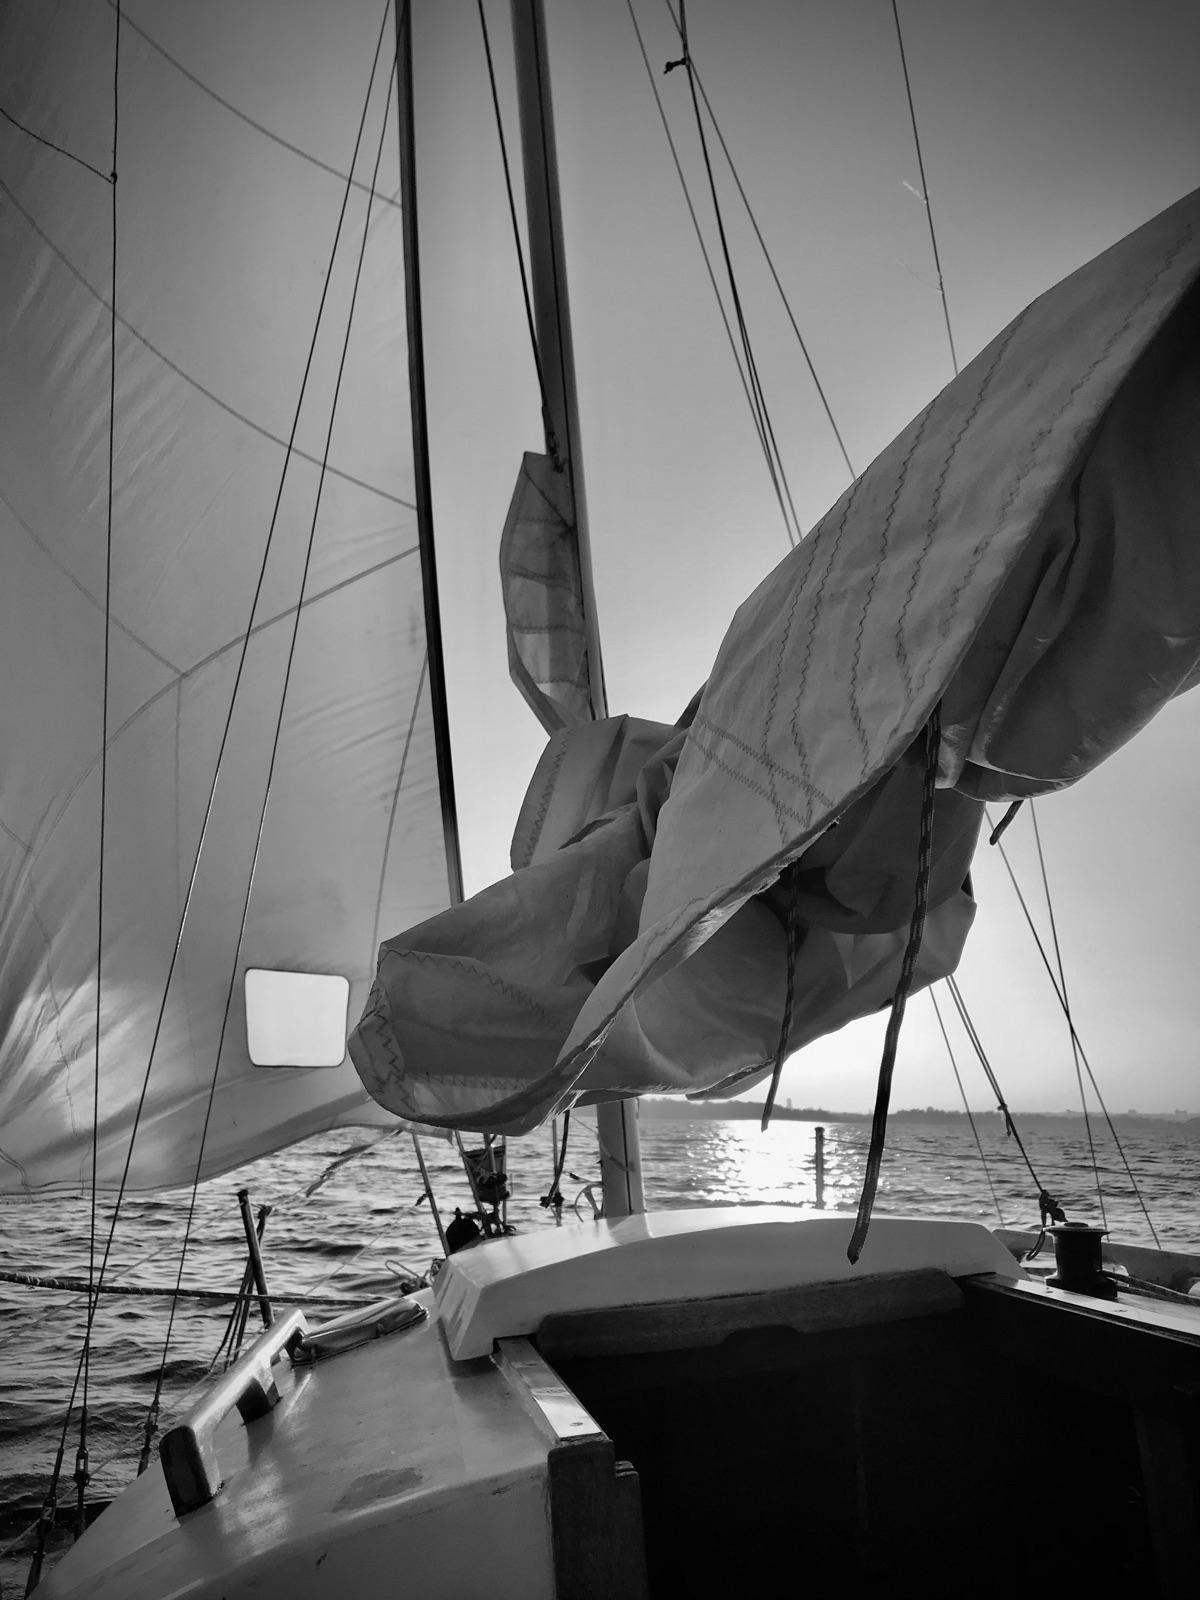 Sailing dawn // picture serene - blueskipper | ello